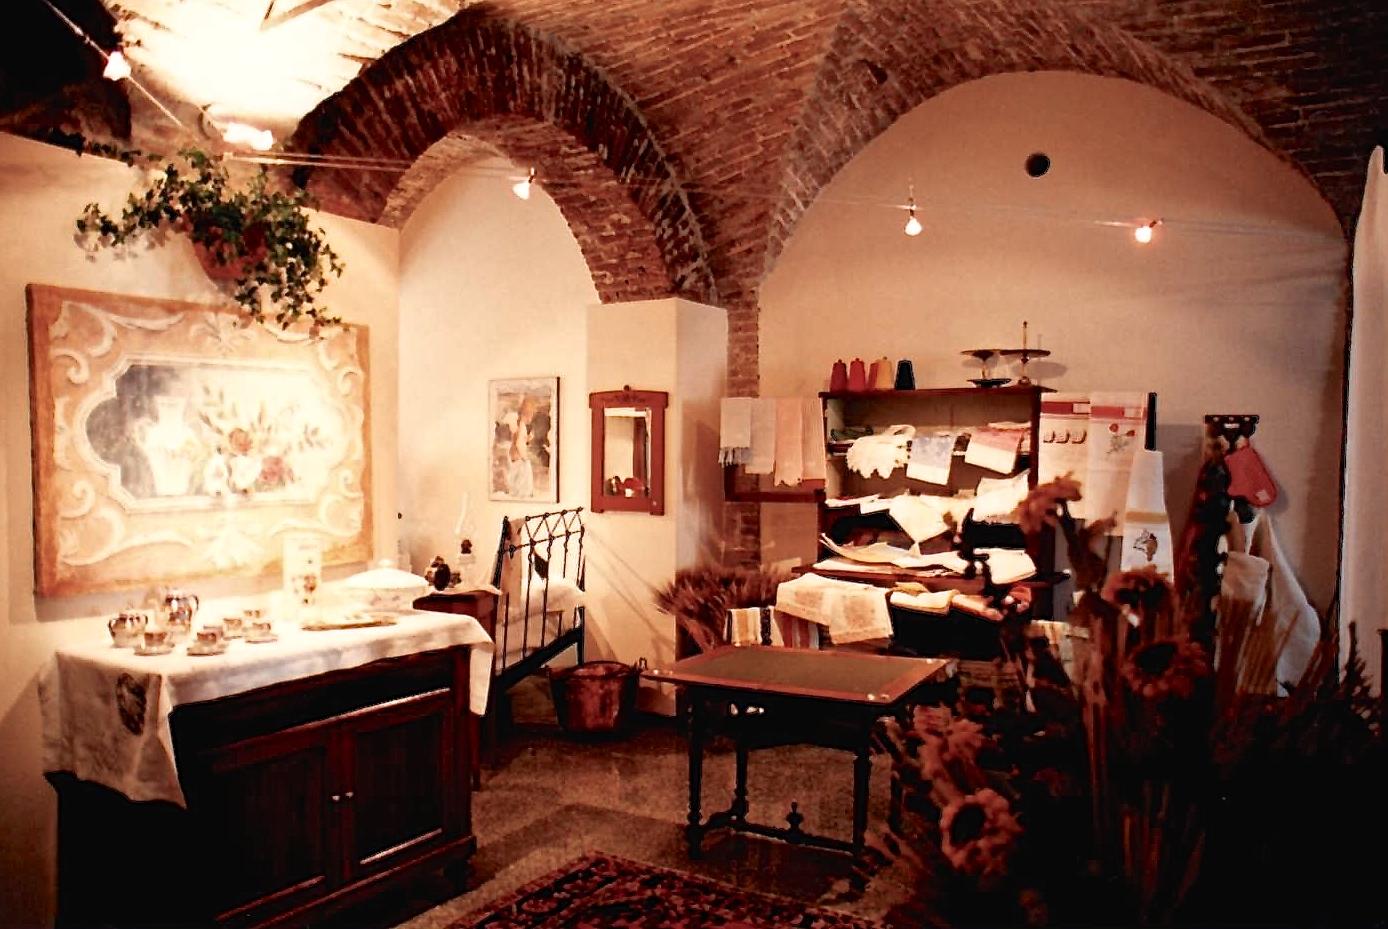 Progettazione Dinterni Udine : Maison magique di loredana blazko u udinelo studio maison magique